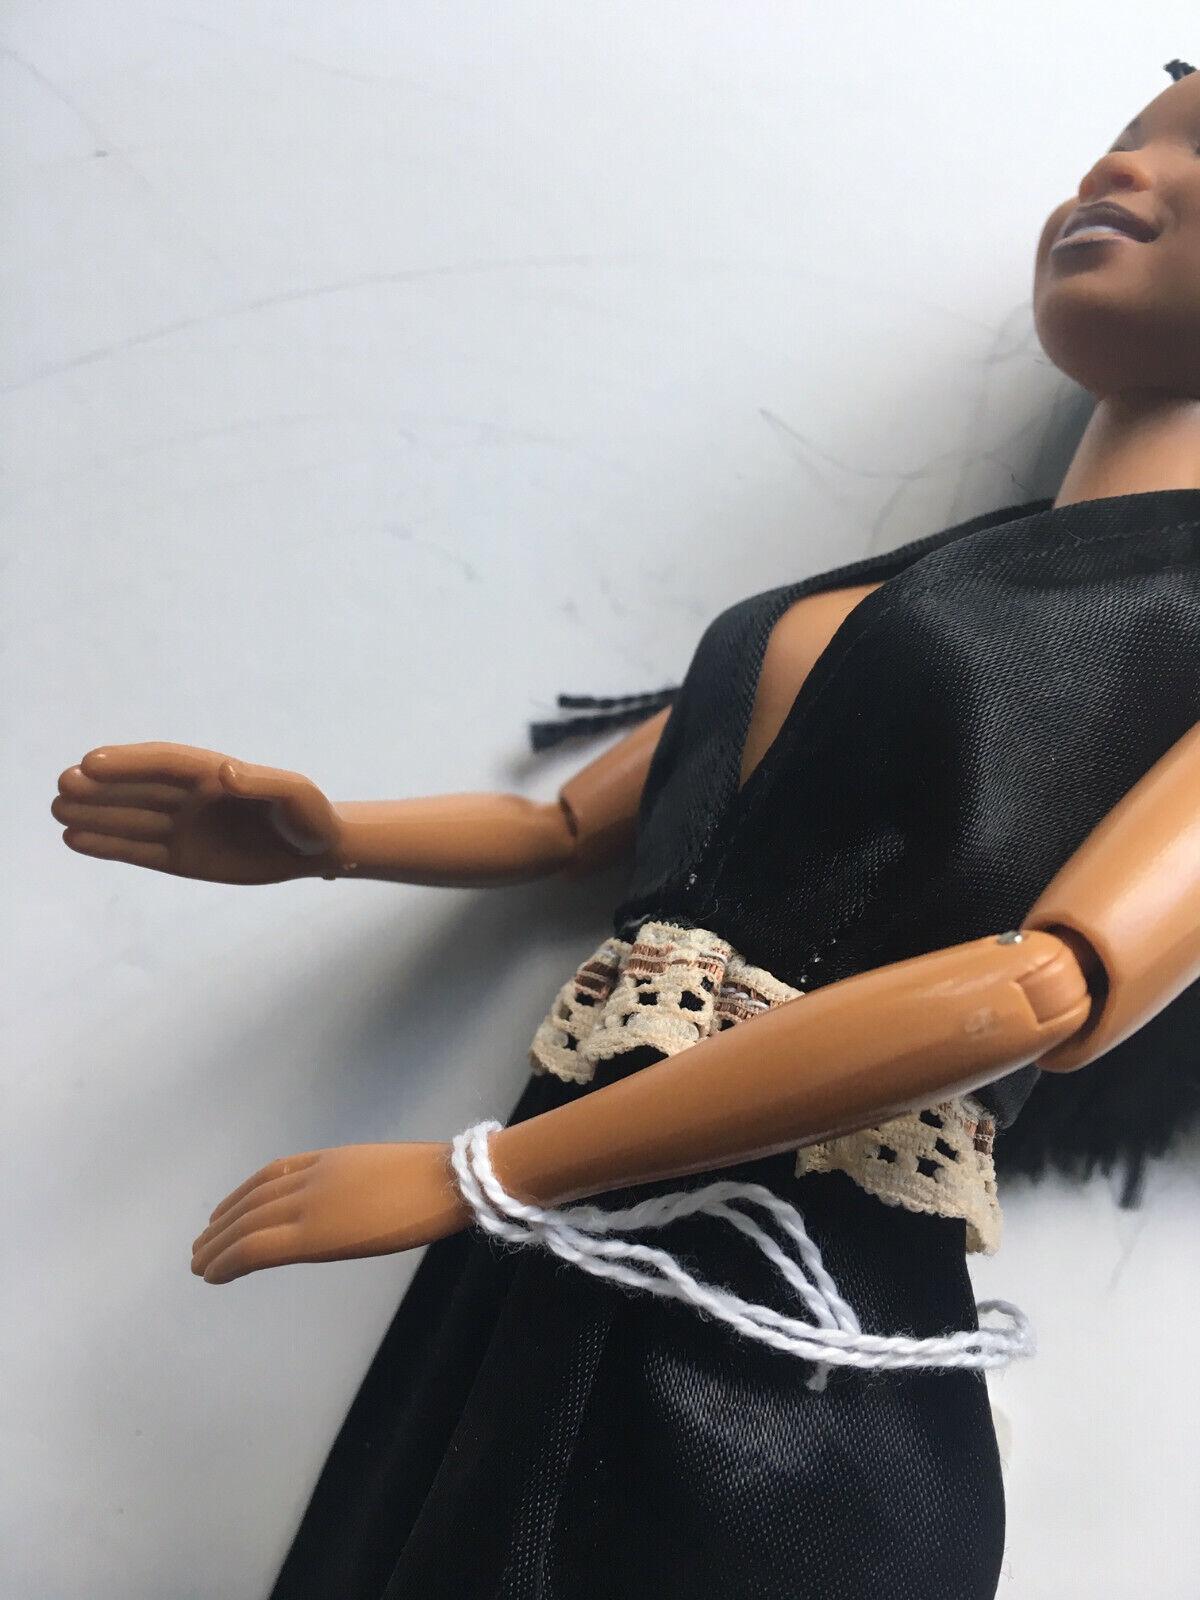 1999 Brand Nu Inc. Brandy Norwood Barbie - $99.95